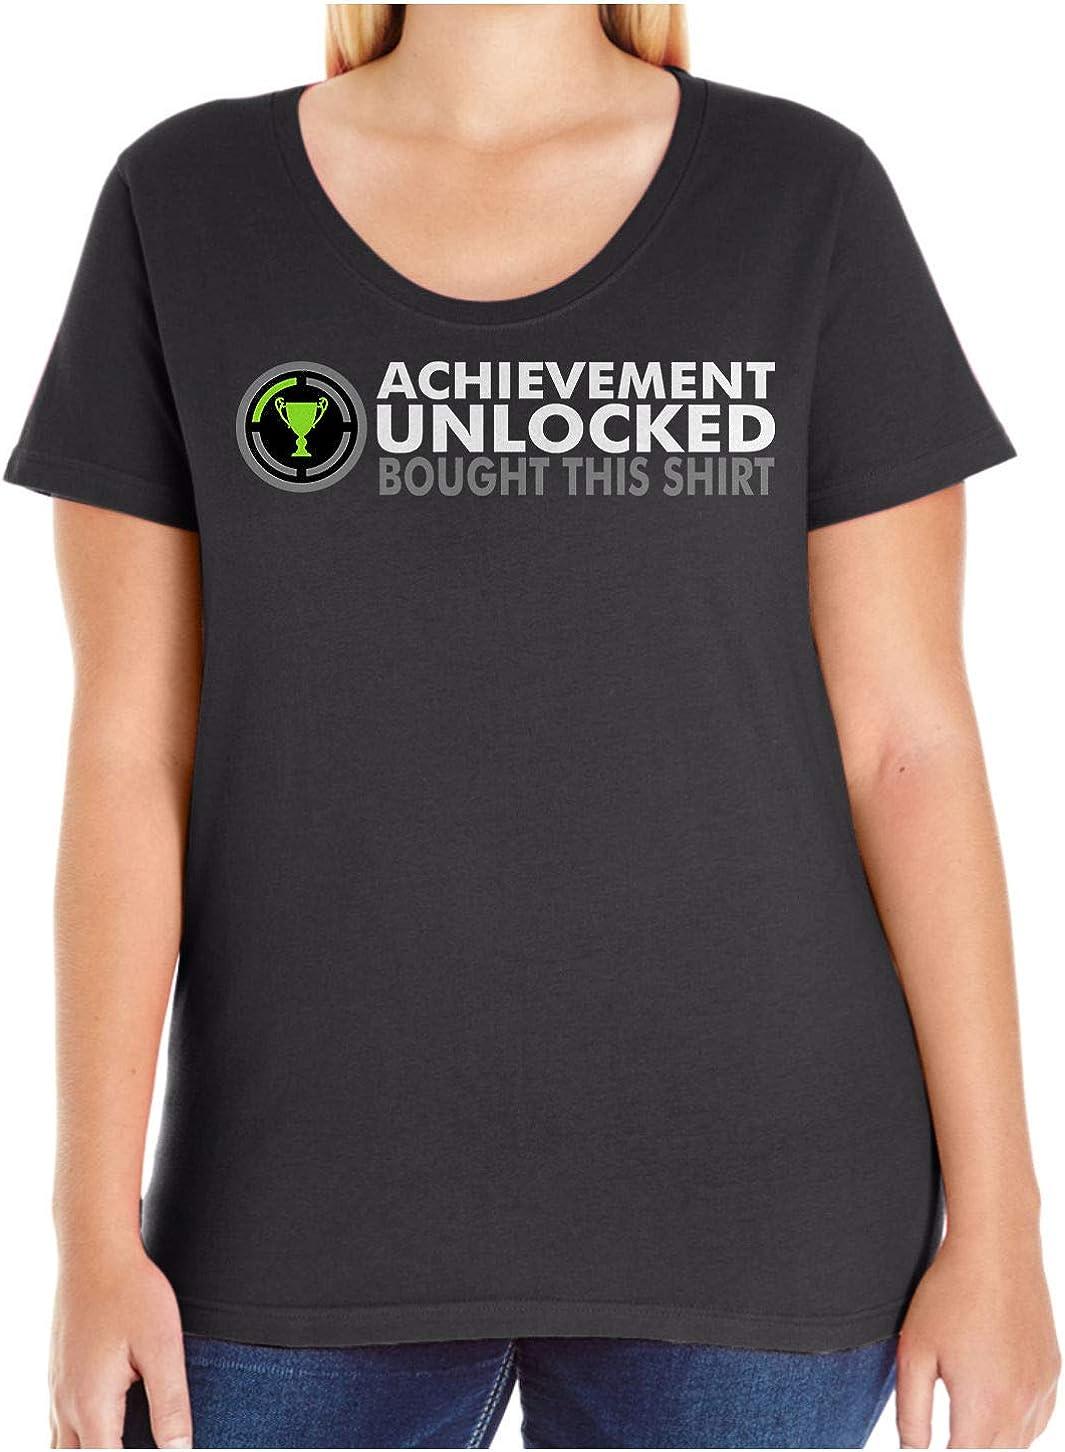 HARD EDGE DESIGN Women's Achievement Unlocked Bought This T-Shirt